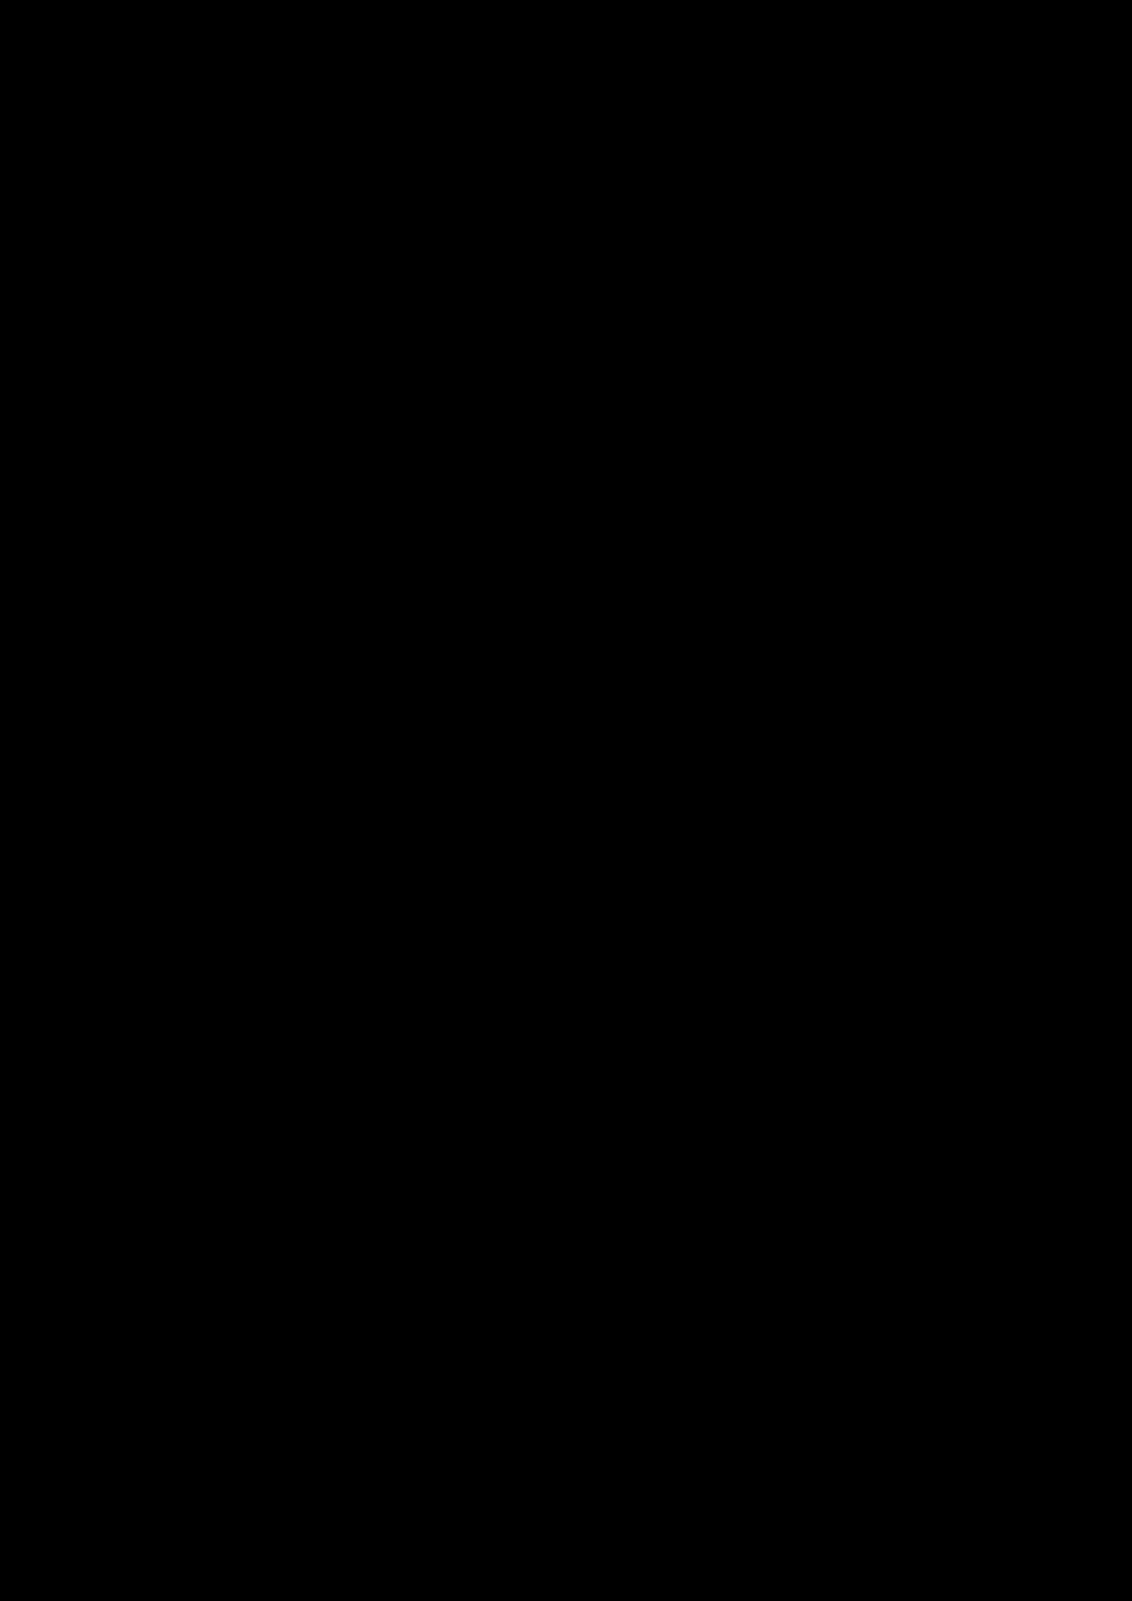 Ispoved Pervogo Boga slide, Image 46